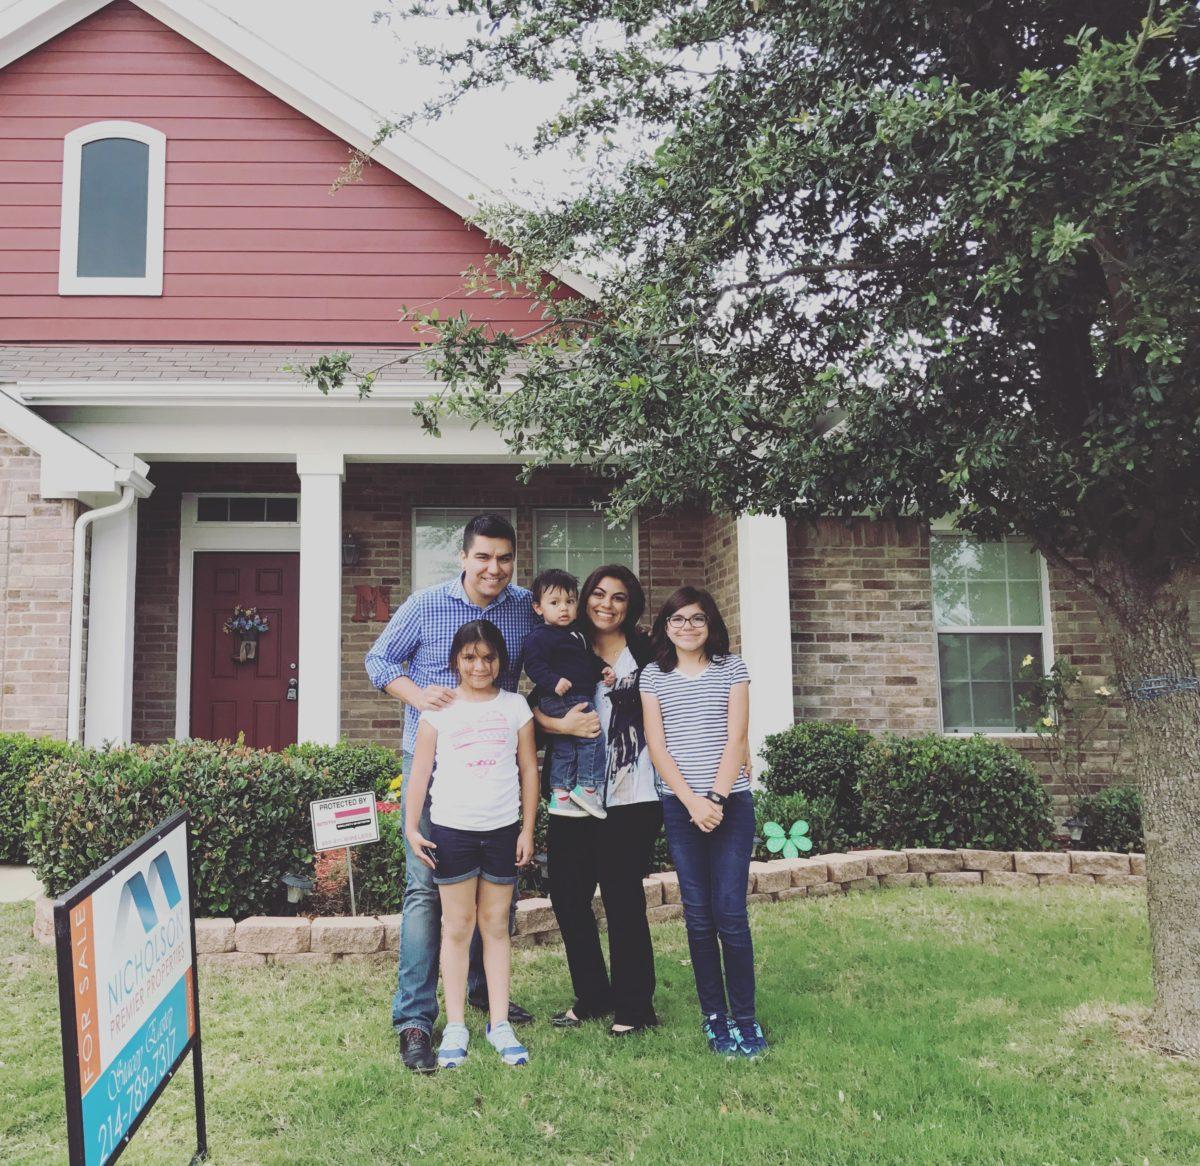 Carlos-family-home-1200x1166.jpg